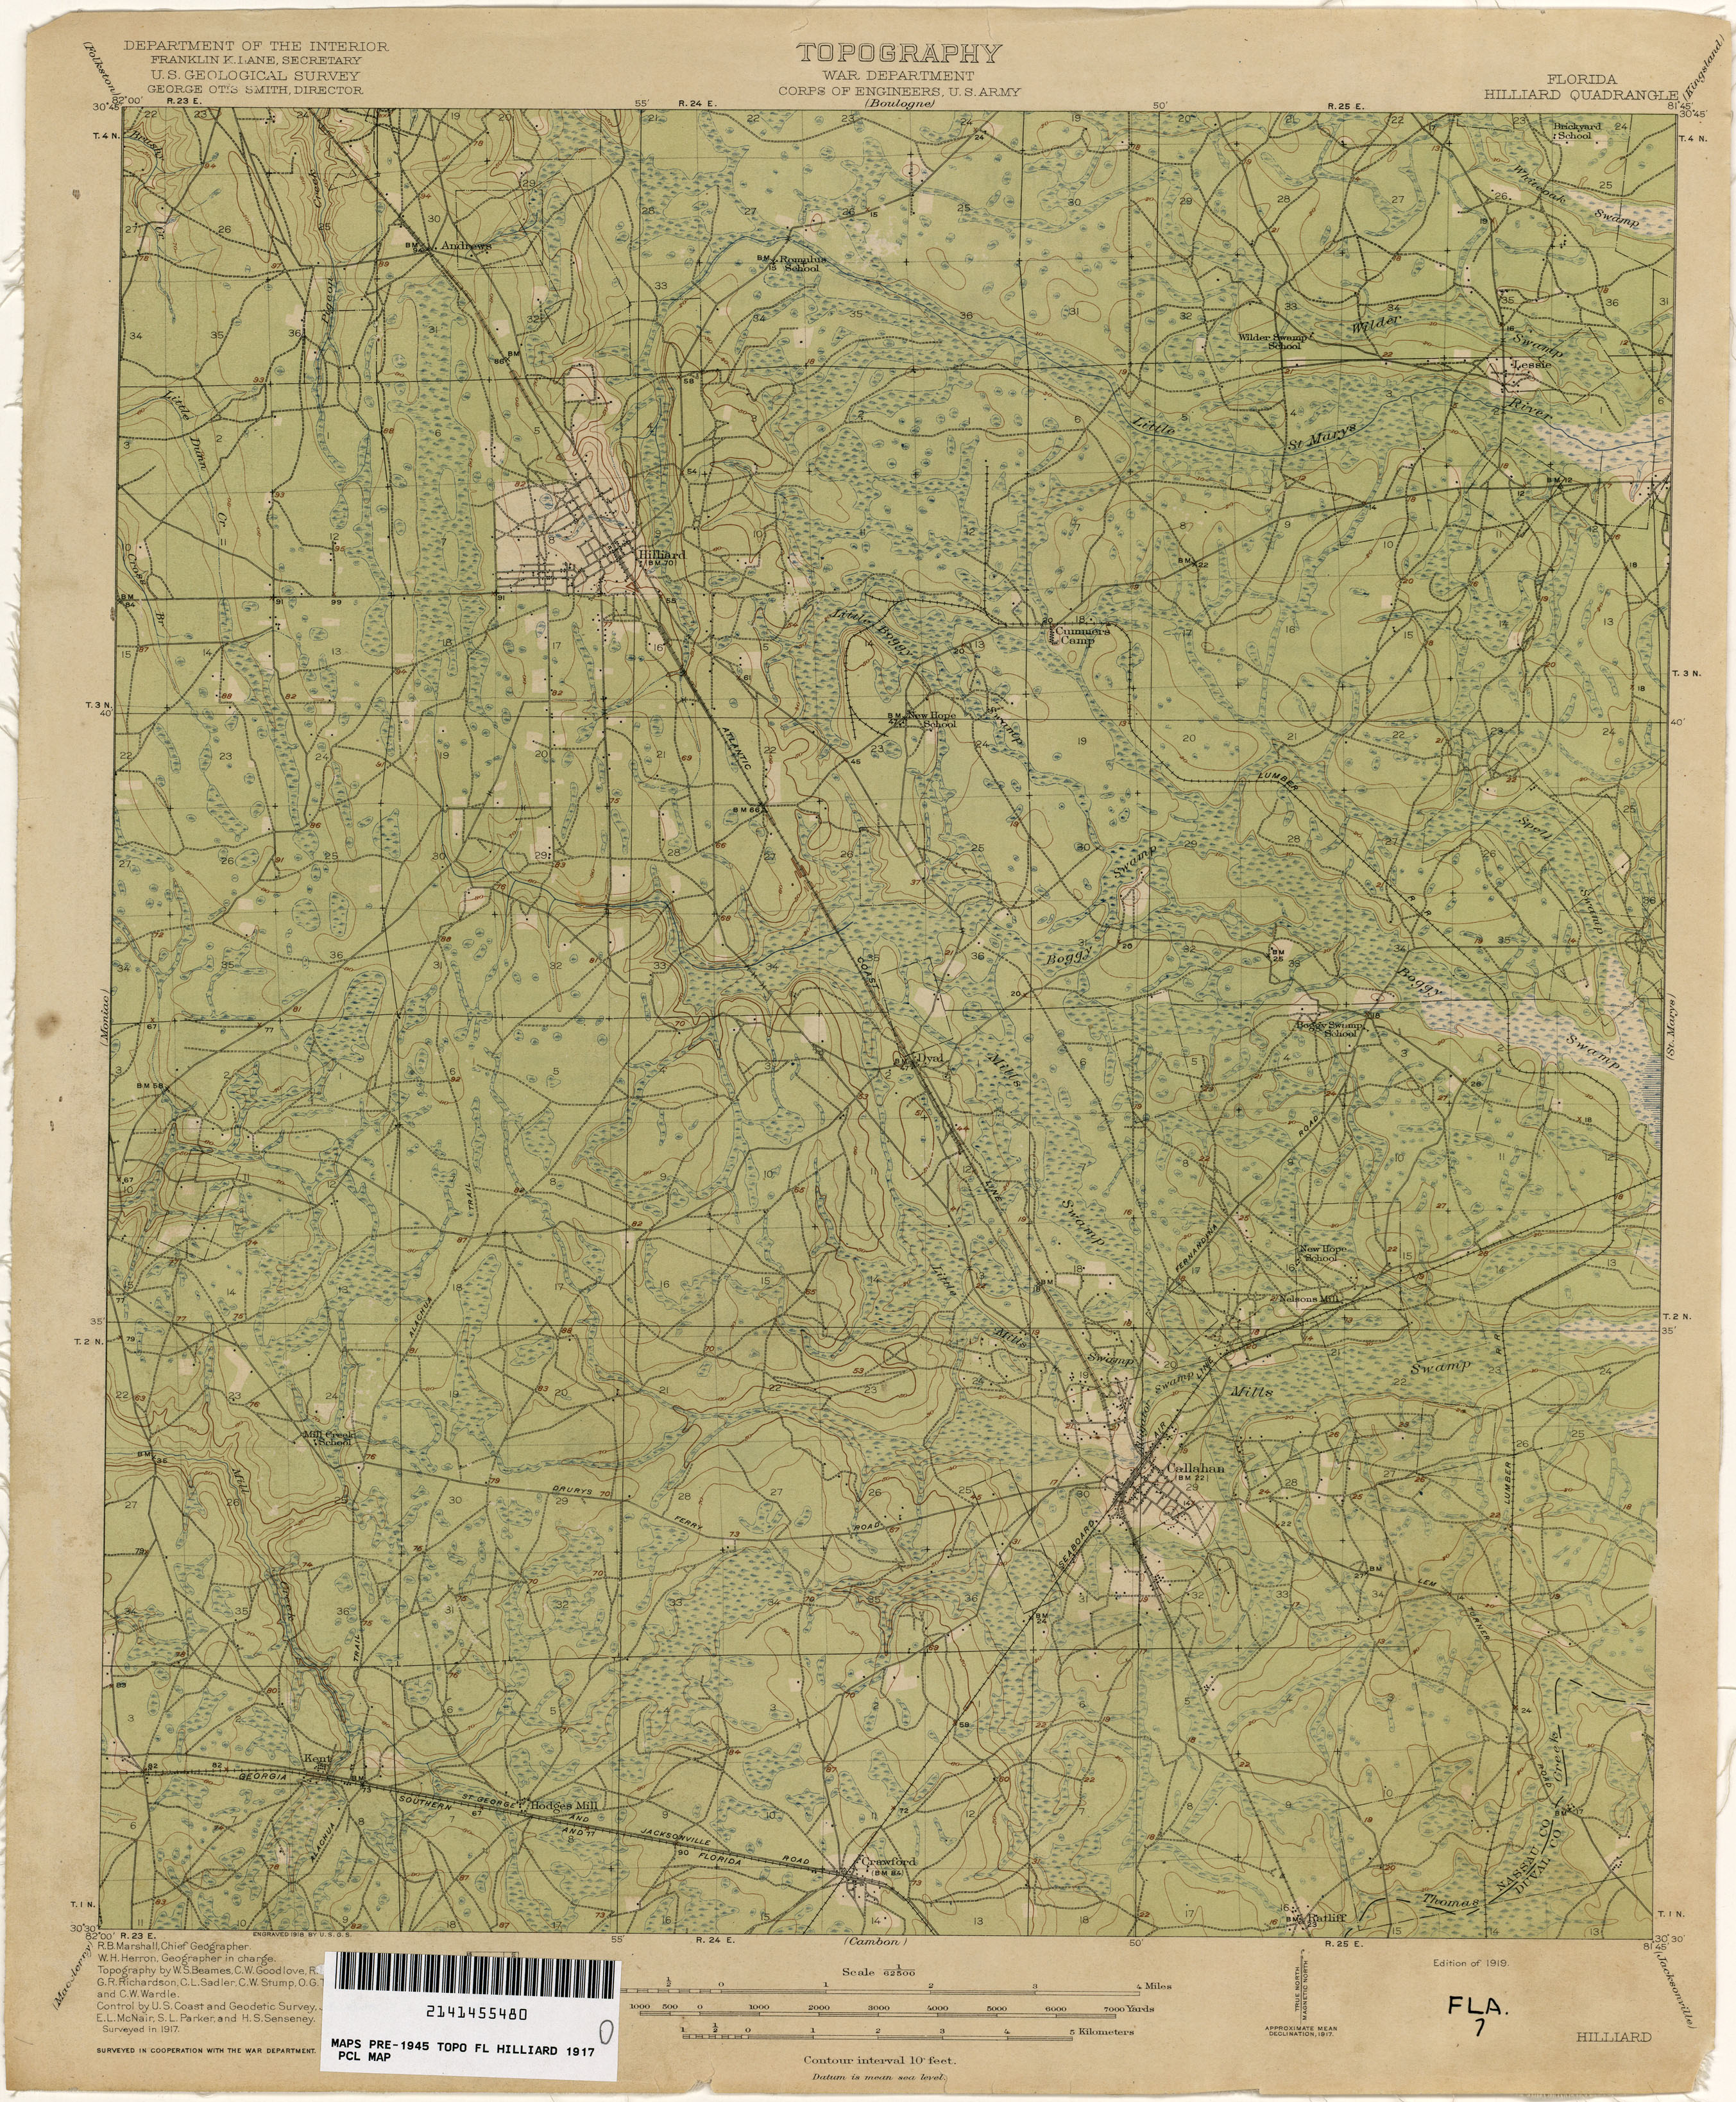 Florida Historical Topographic Maps PerryCastañeda Map - Florida quad map